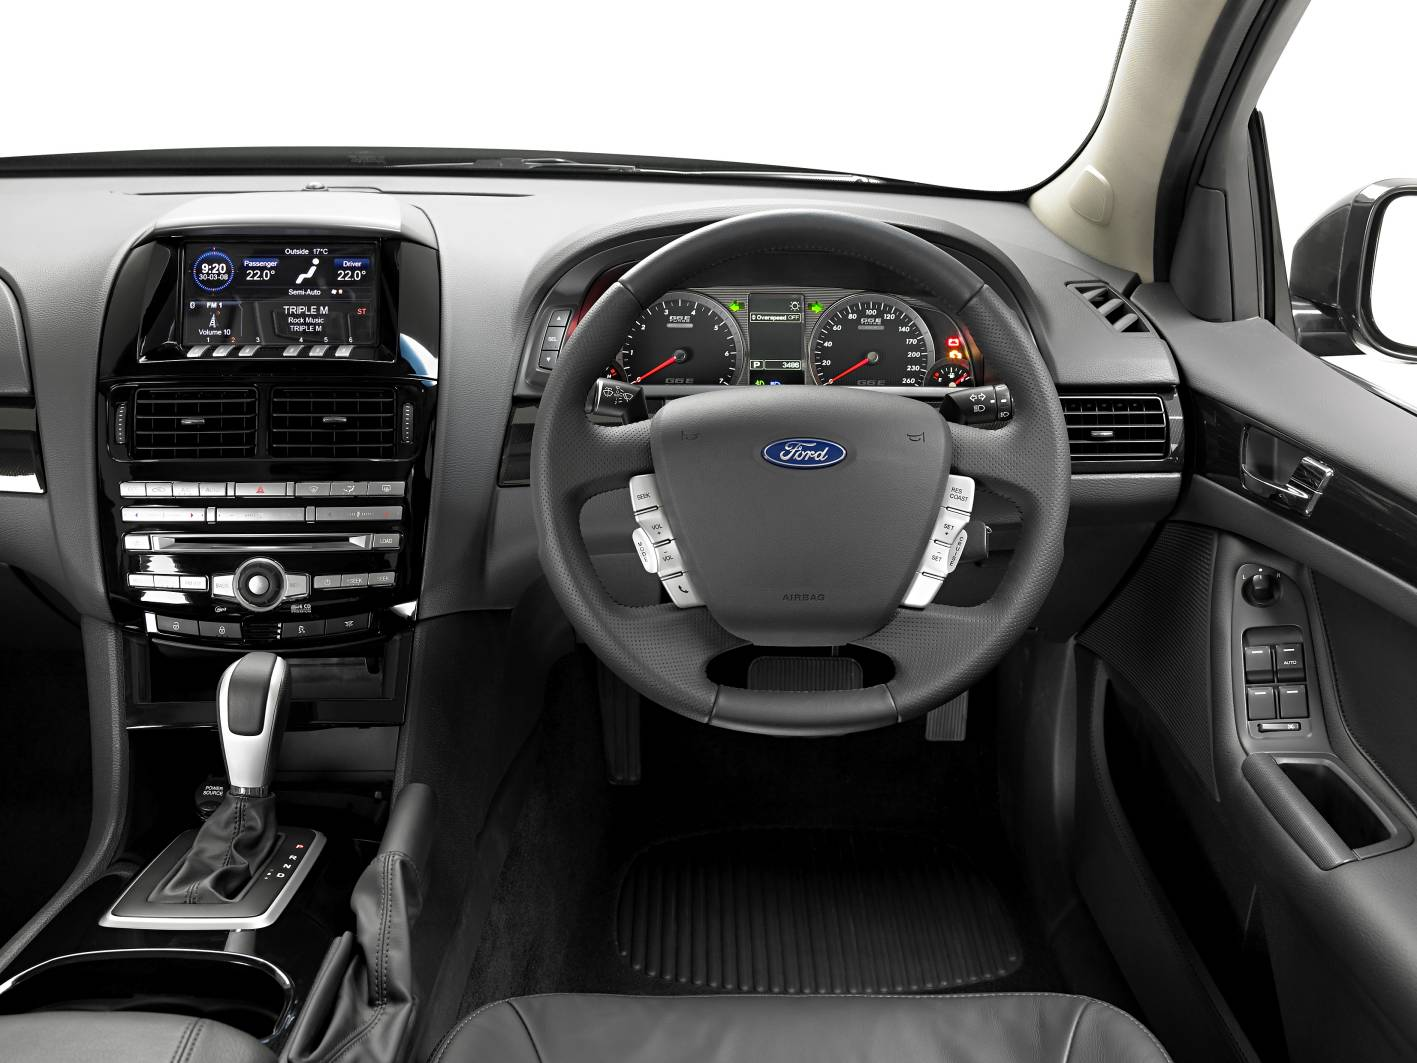 2008-ford-falcon-g6et-tmr-23.jpg